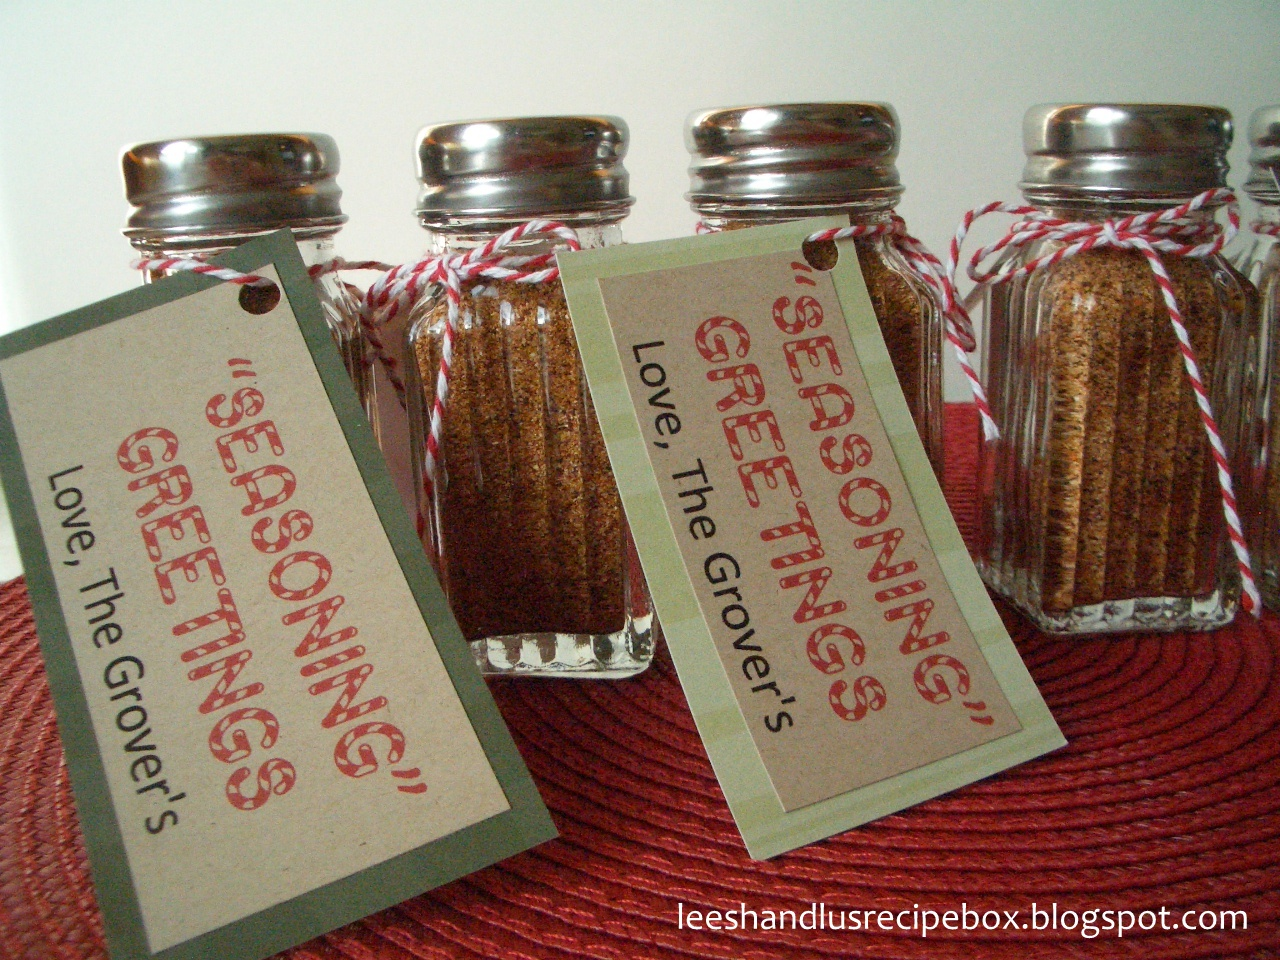 Neighbor Christmas Gift Ideas | Seasoning Greetings | Leesh & Lu's Recipe Box